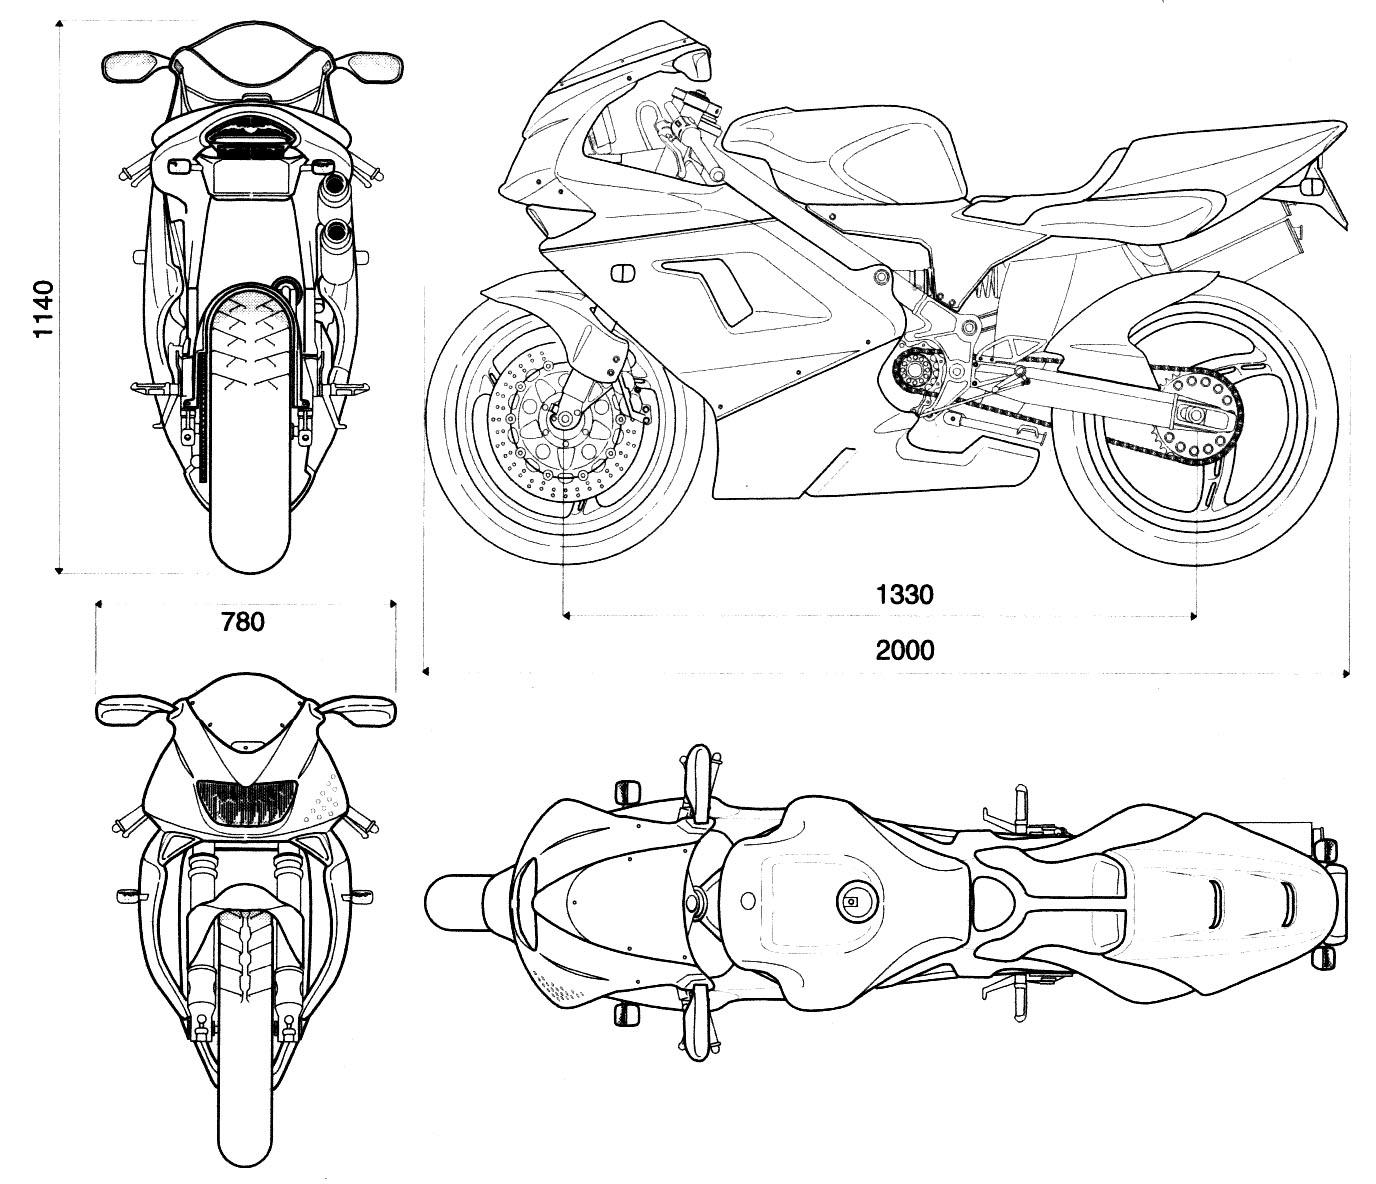 Honda Ct90 Wiring Diagram 1971 in addition Redcat 50cc Atv Wiring Diagram additionally WiringYamaha in addition Honda Trail 70 Clutch Diagram Html moreover Honda Atc 90 Wiring Diagram. on honda trail 110 wiring diagram